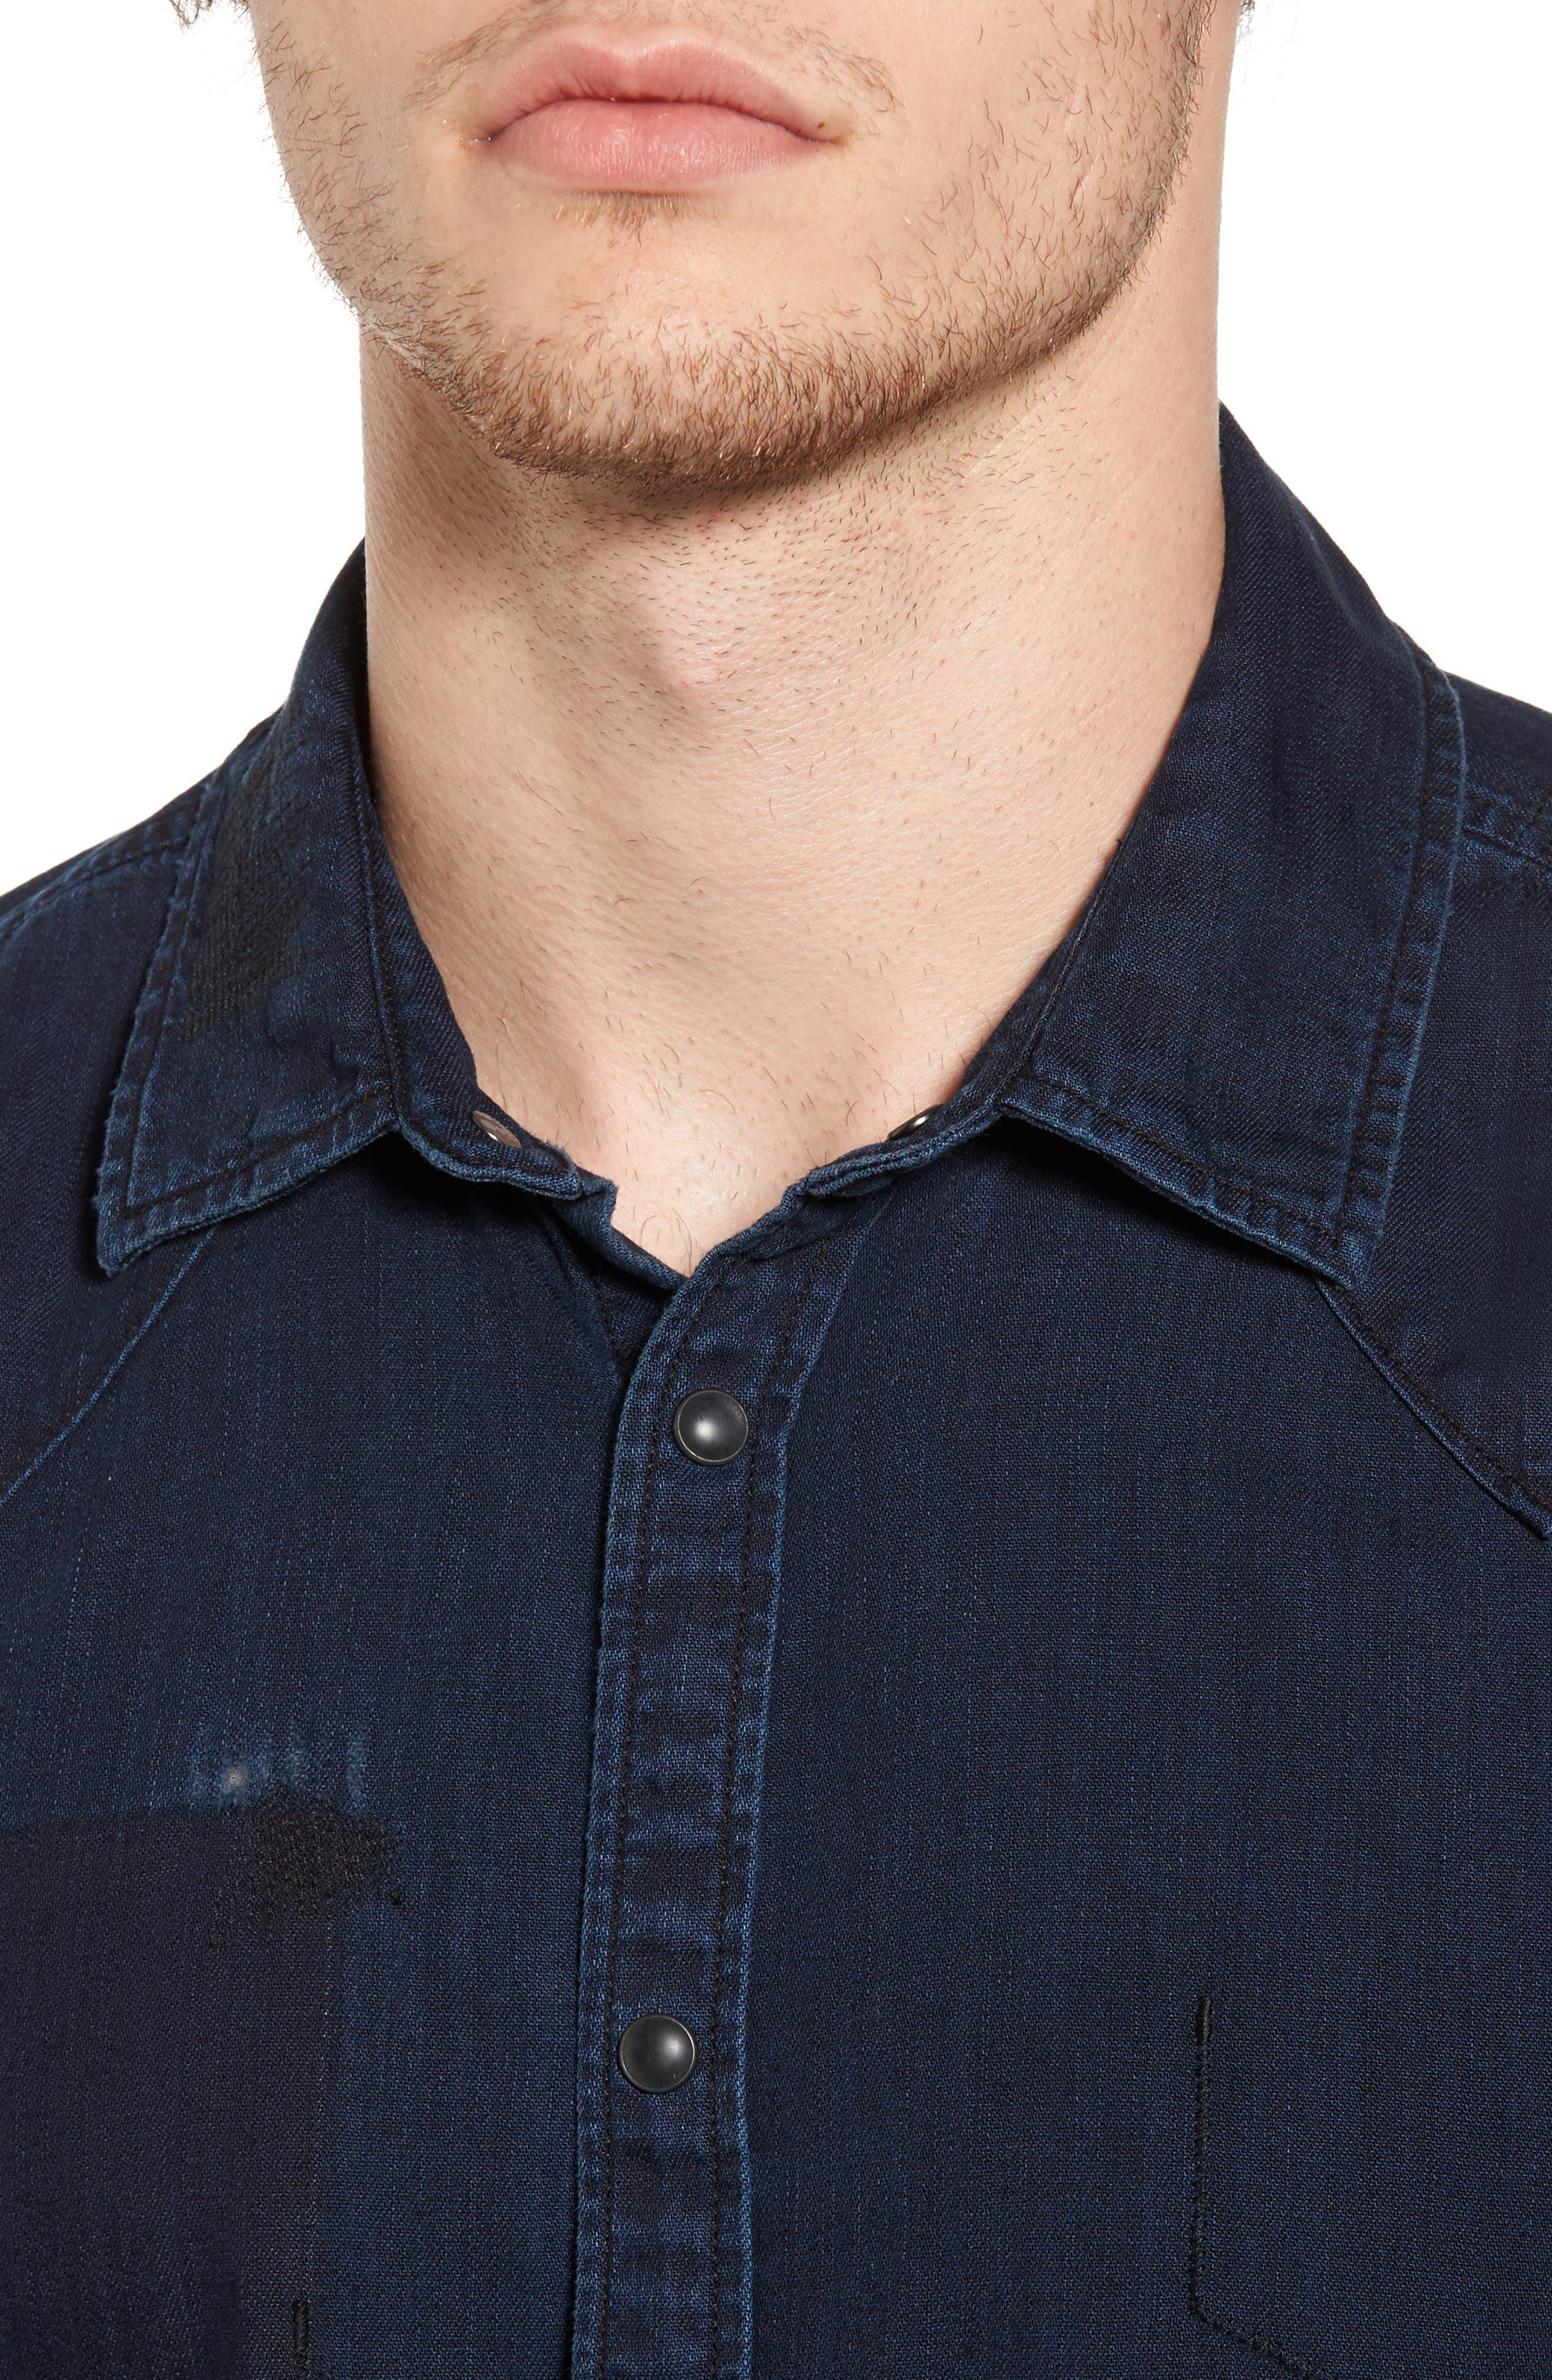 Pocketless Western Denim Shirt,                             Alternate thumbnail 4, color,                             Midnight